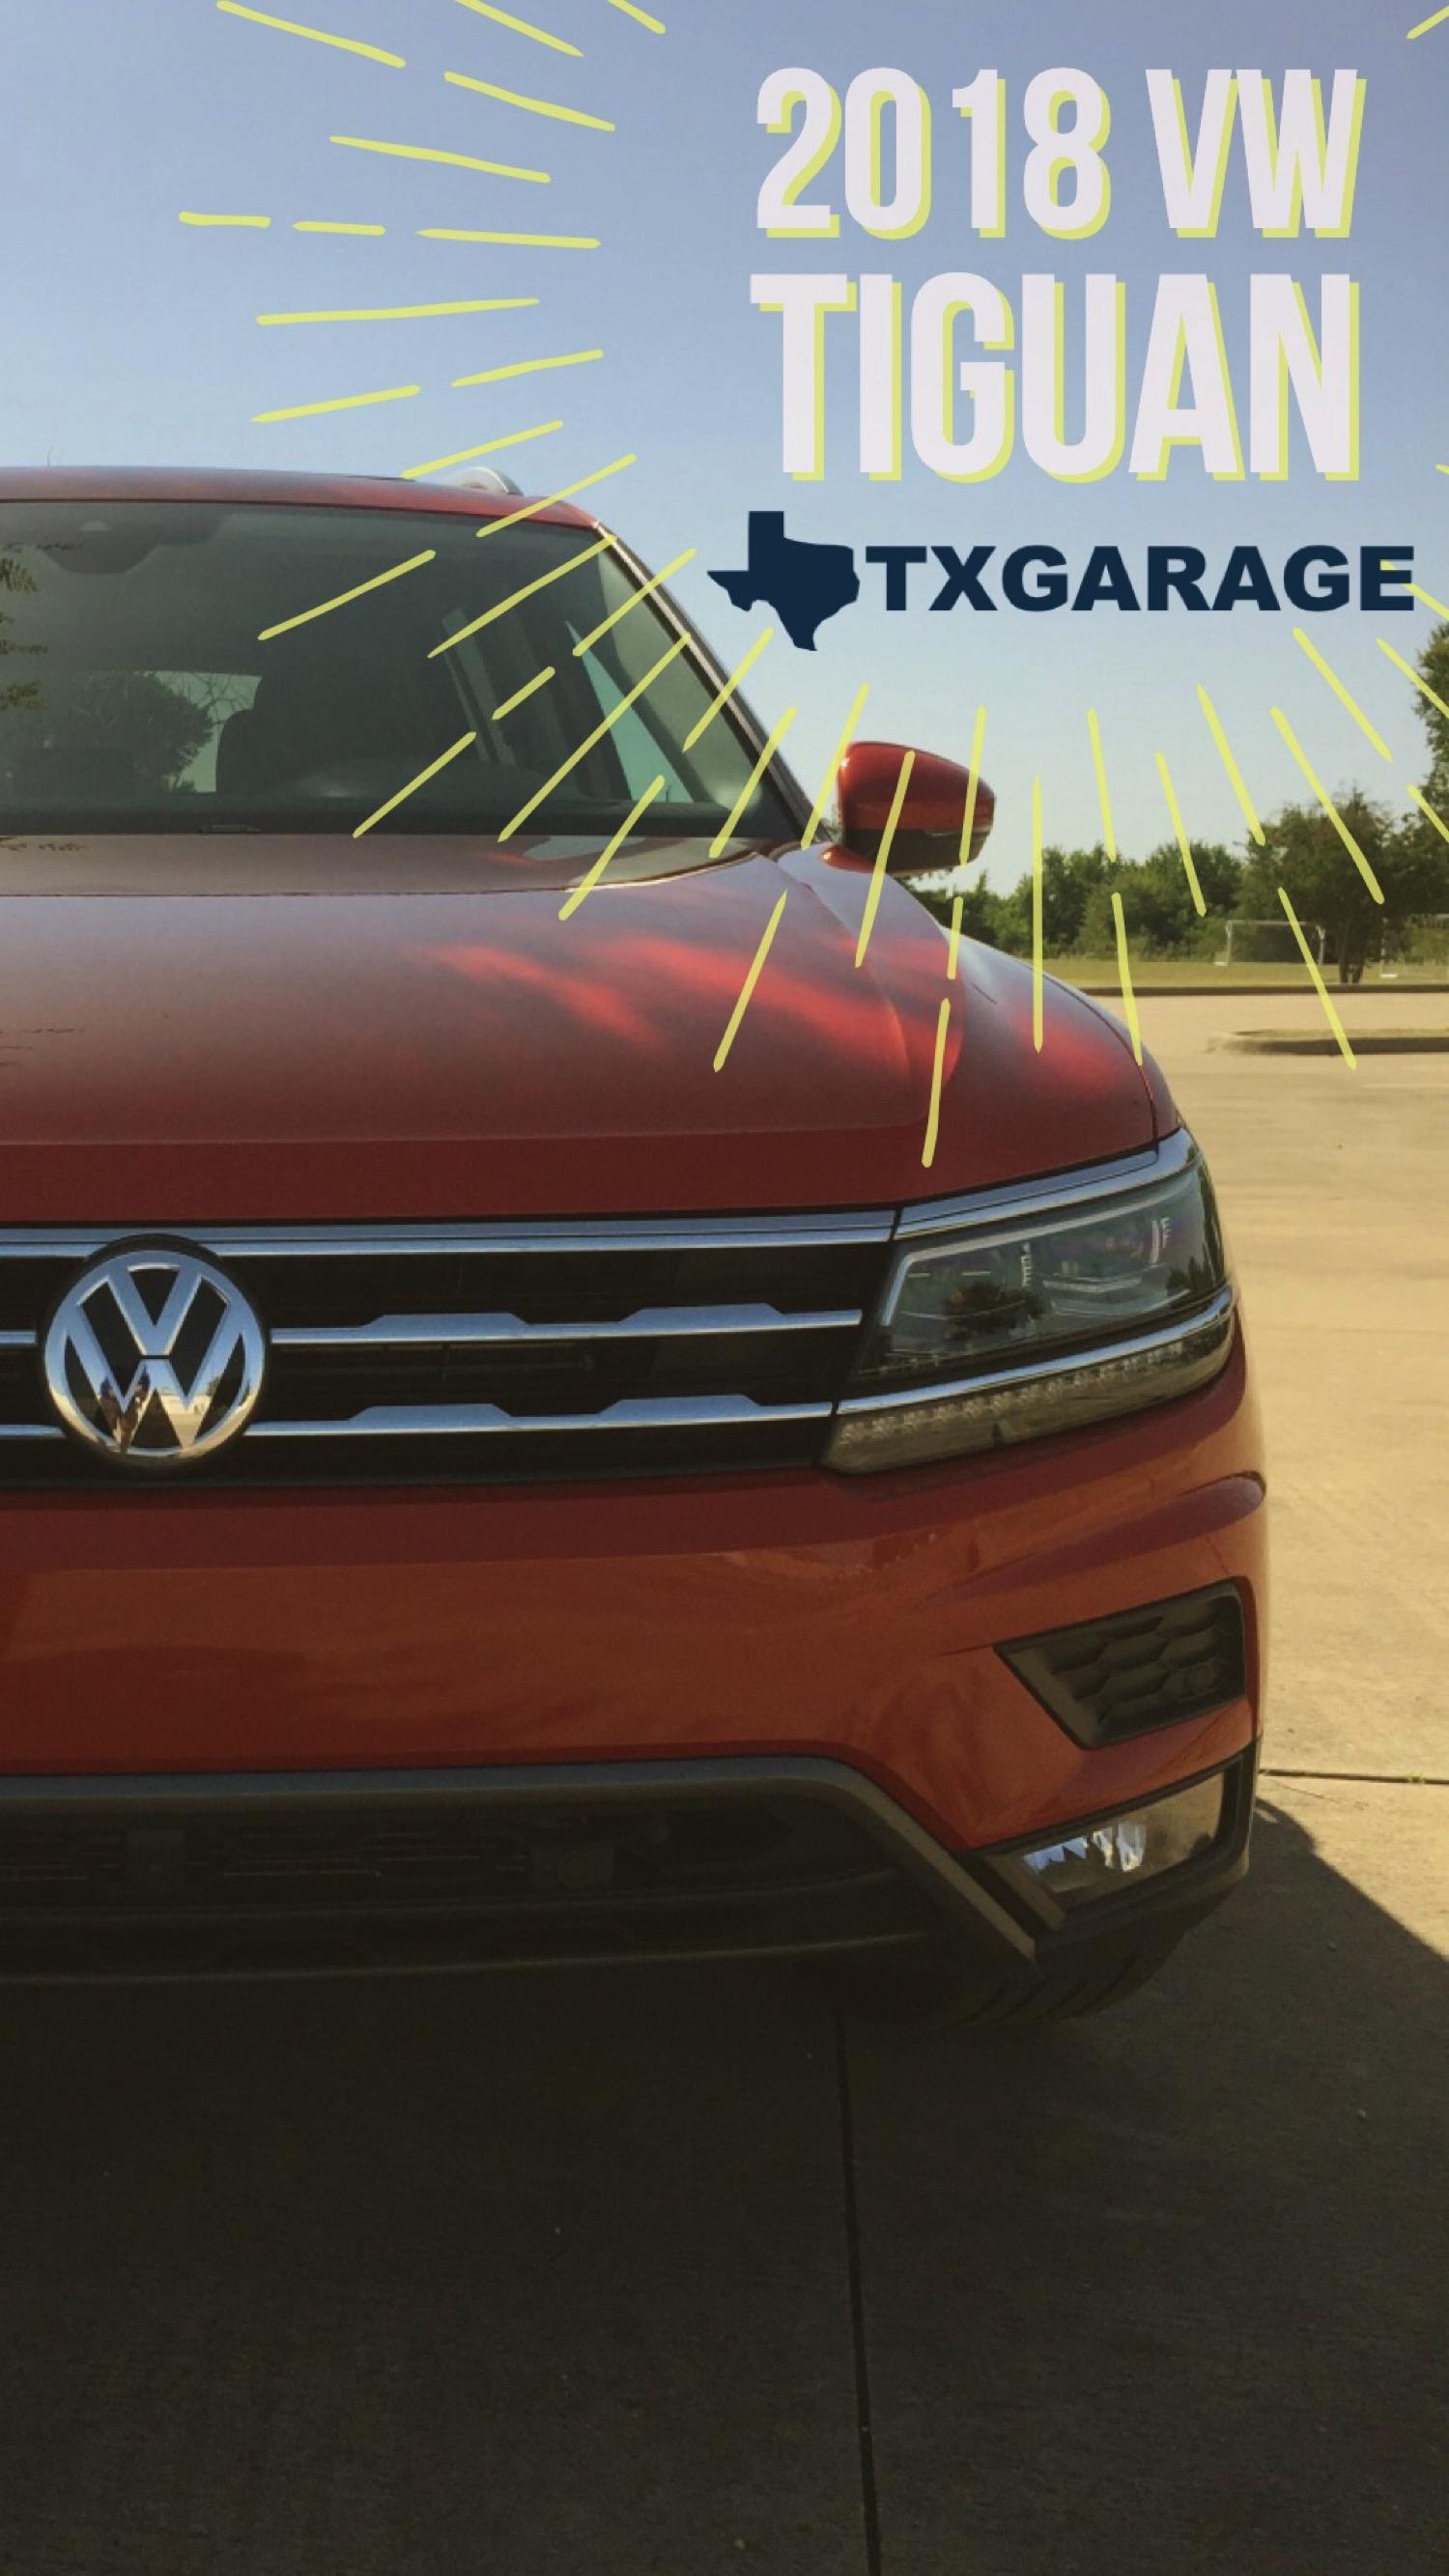 2018-VW-Tiguan–txgarage–13